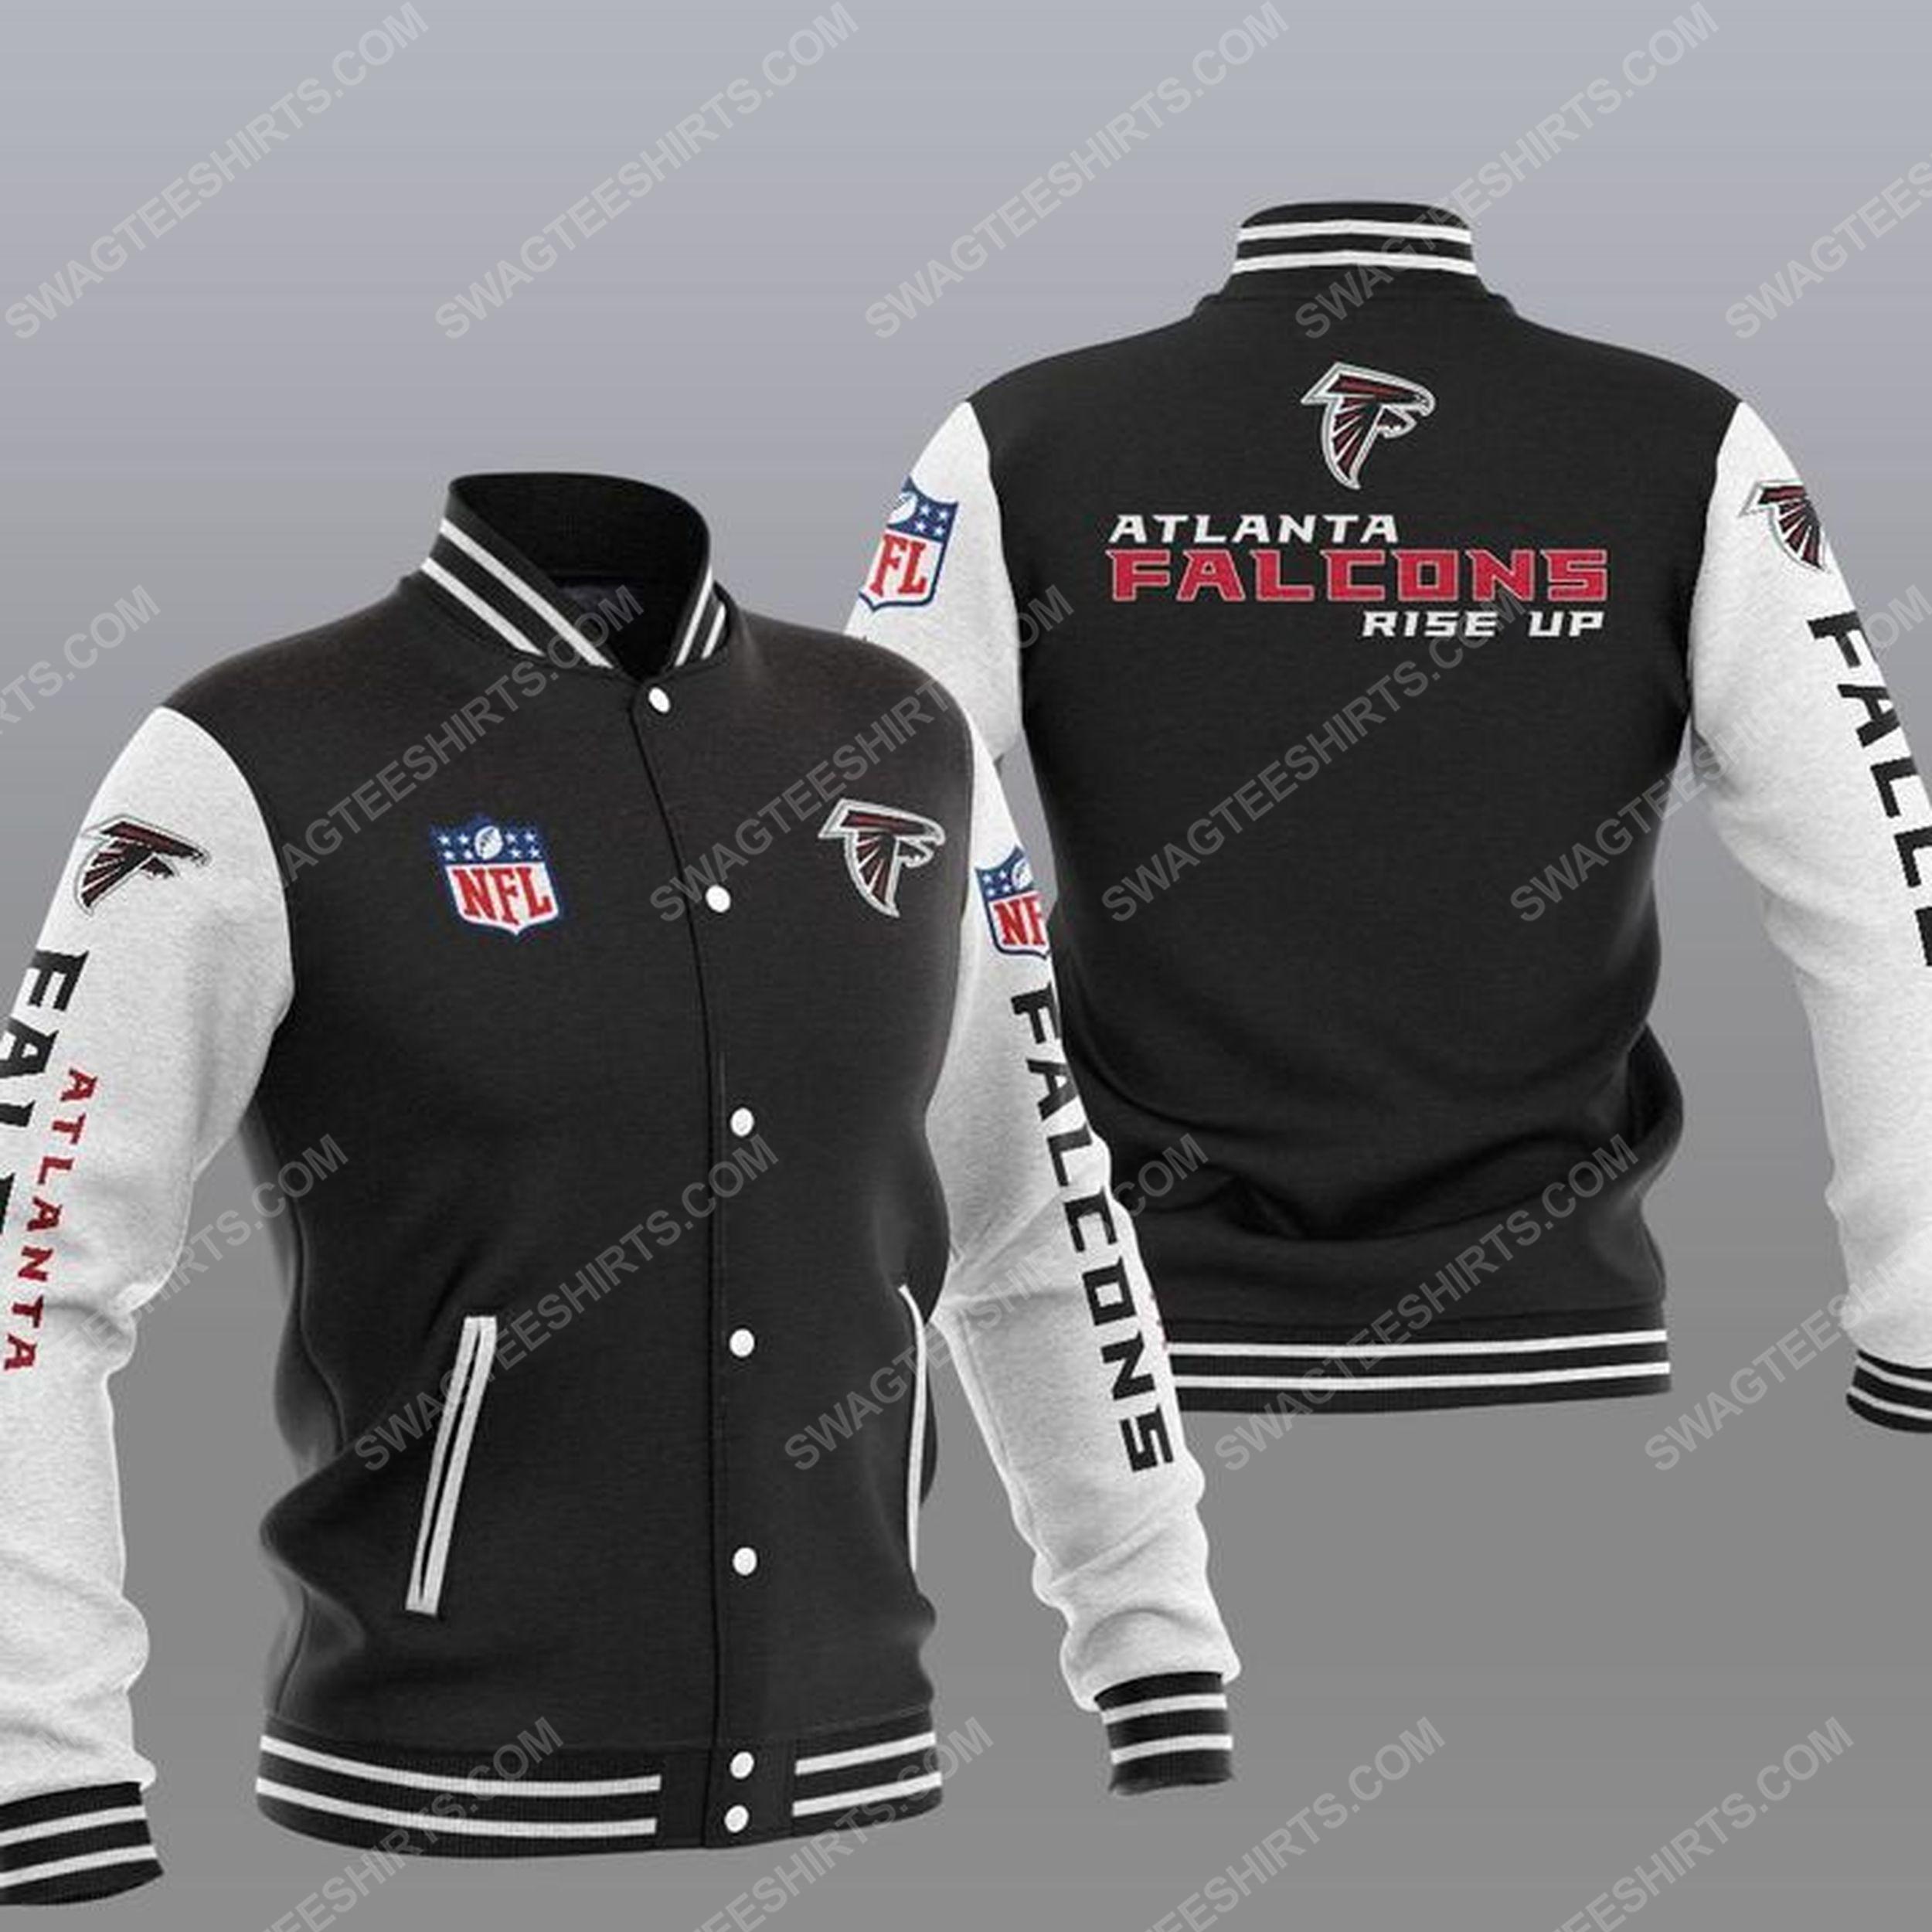 The atlanta falcons rise up all over print baseball jacket - black 1